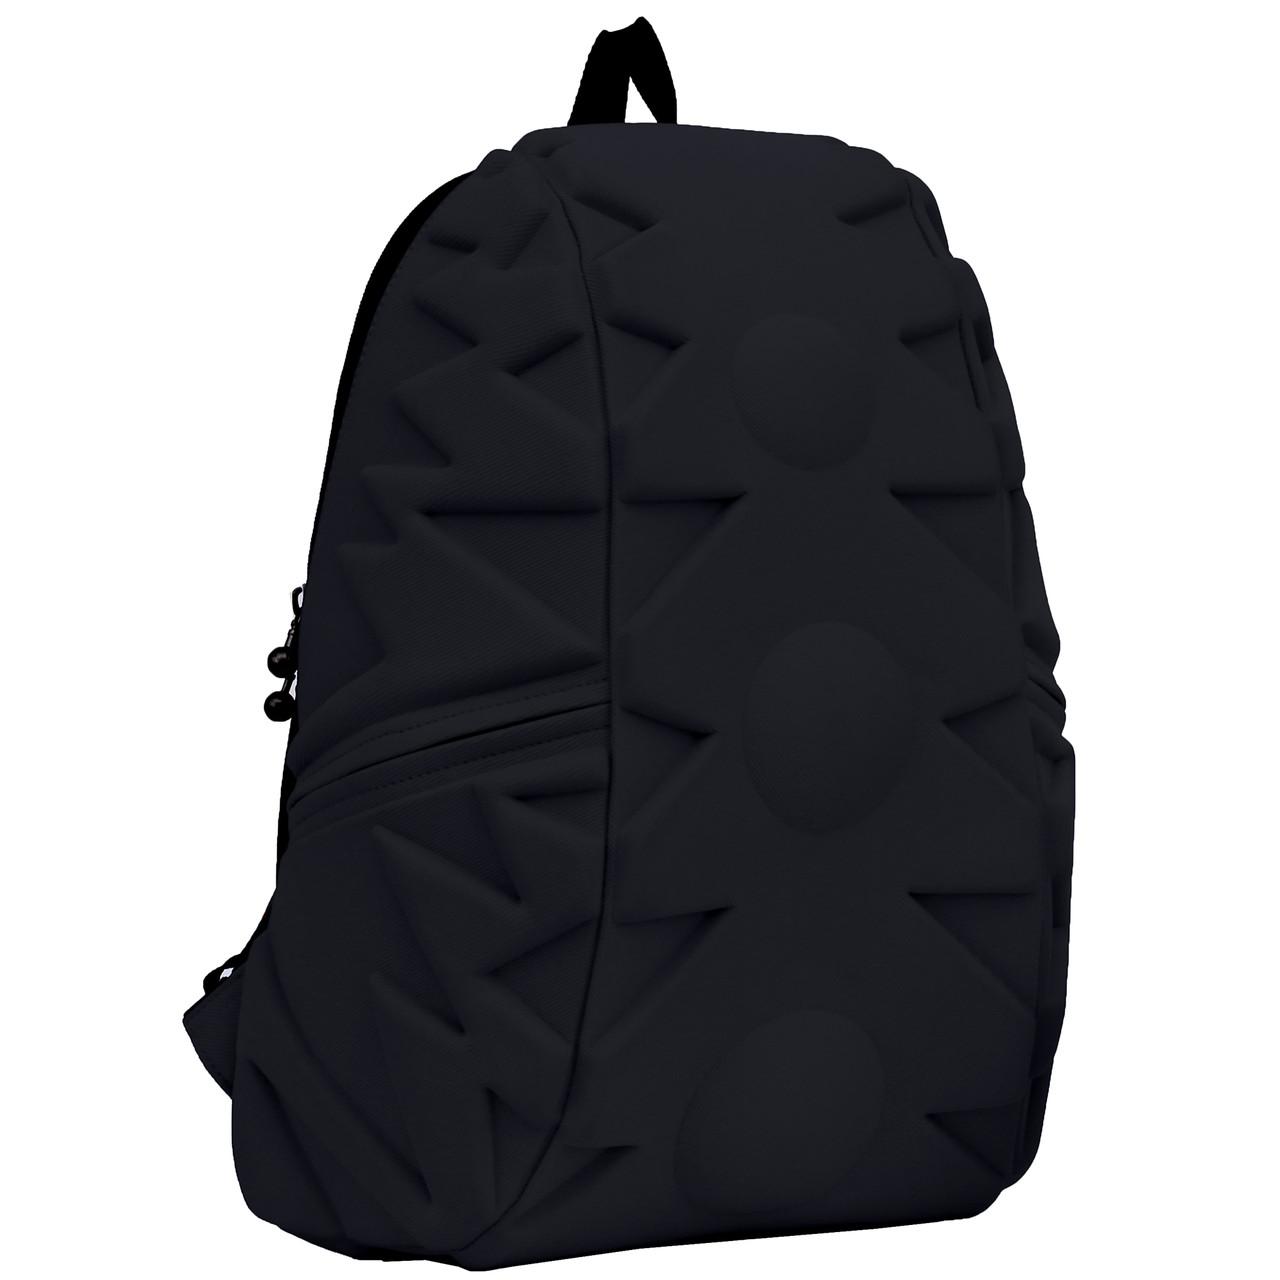 Рюкзак MadPax Exo Full цвет Black (черный)